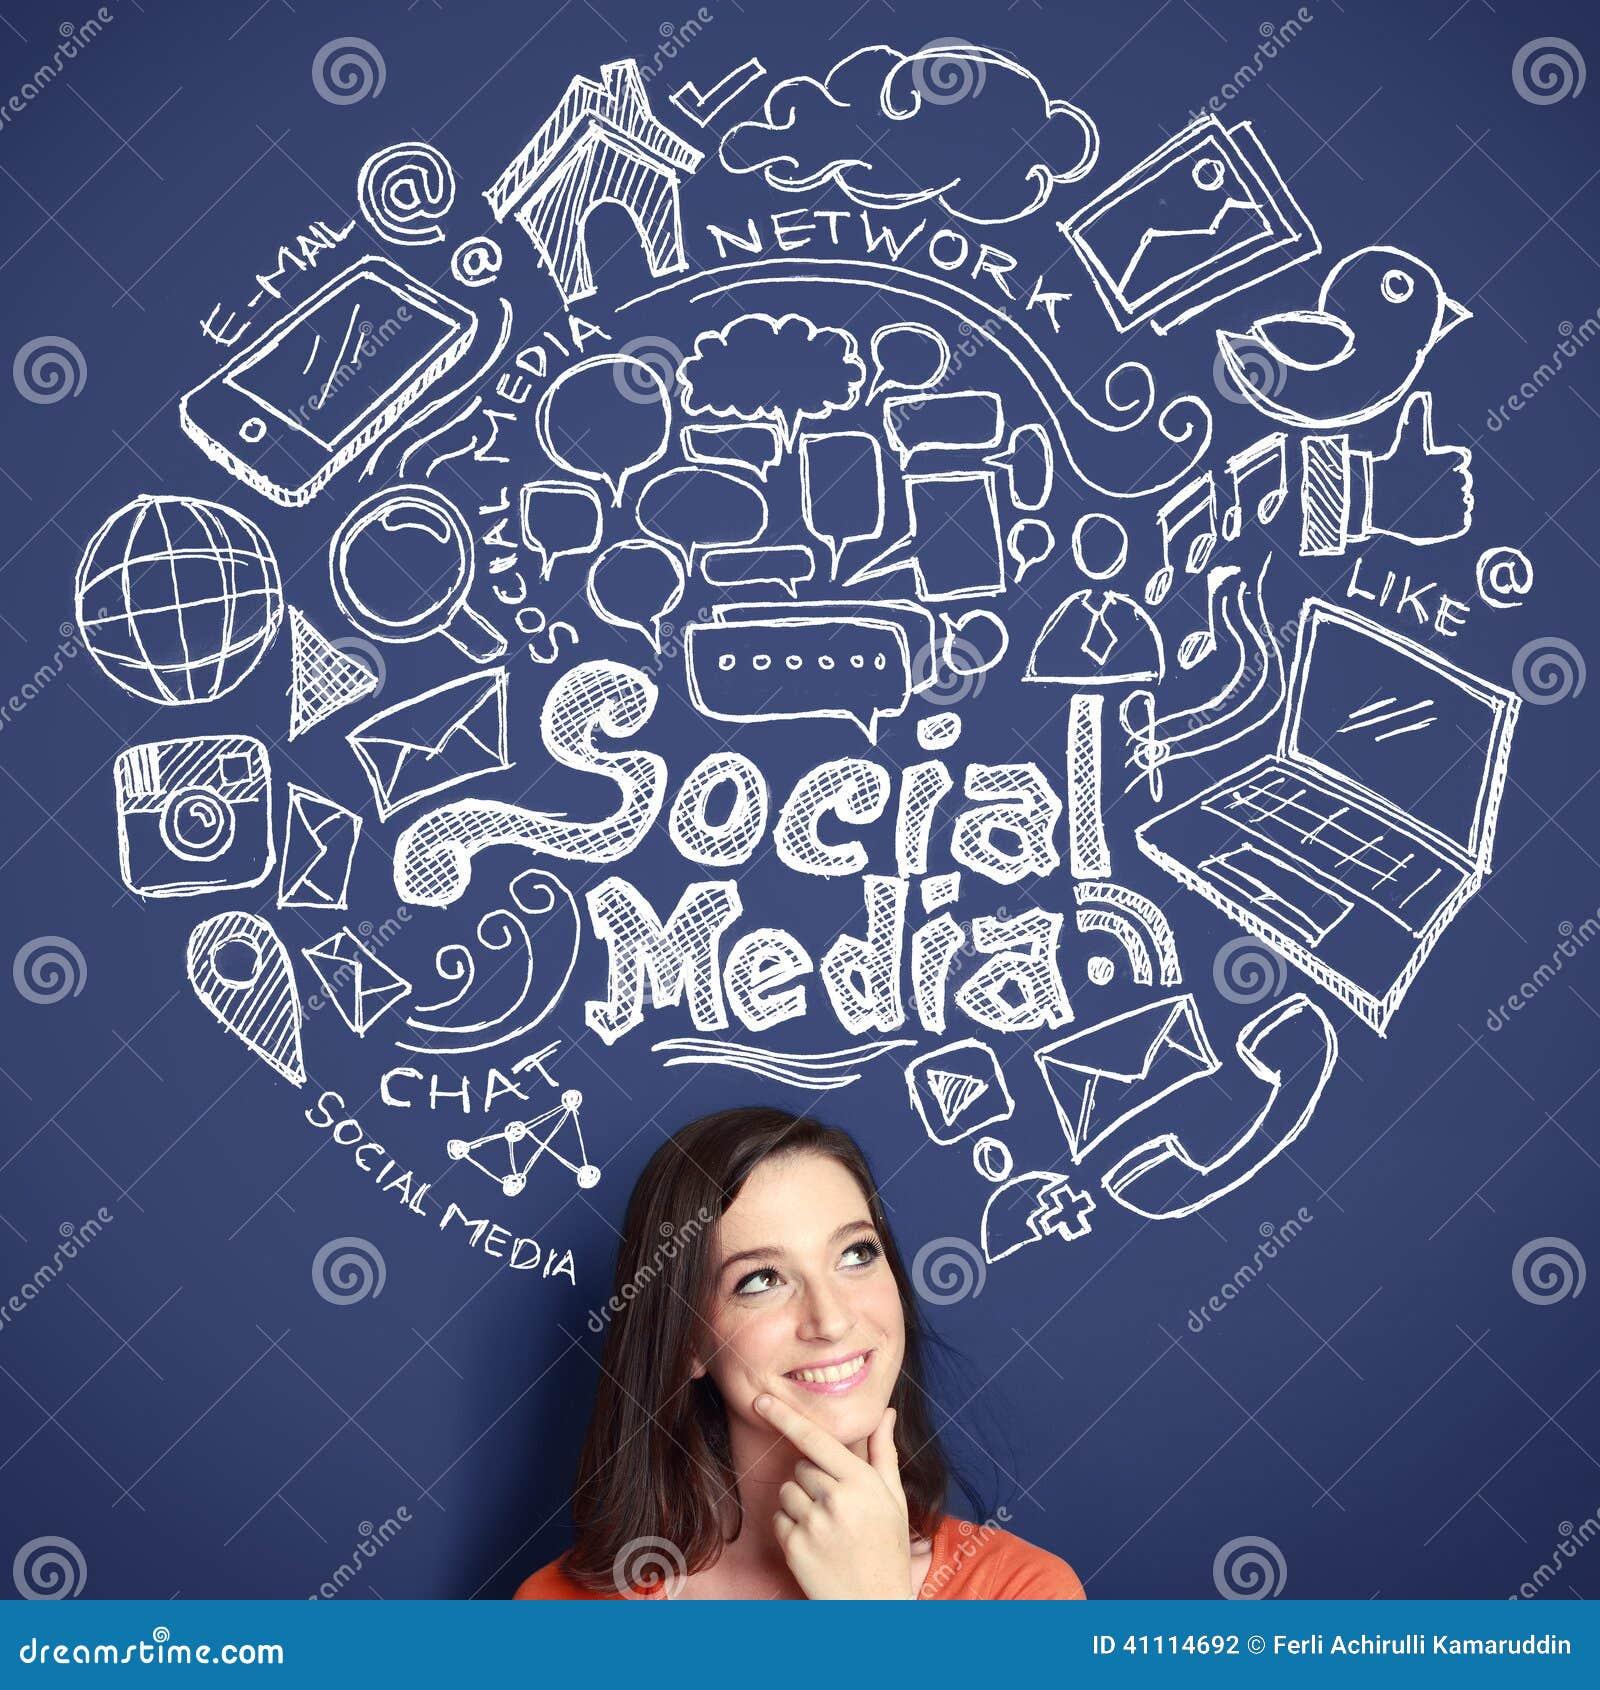 Frau mit Hand gezeichneter Illustration des Social Media-Konzeptes